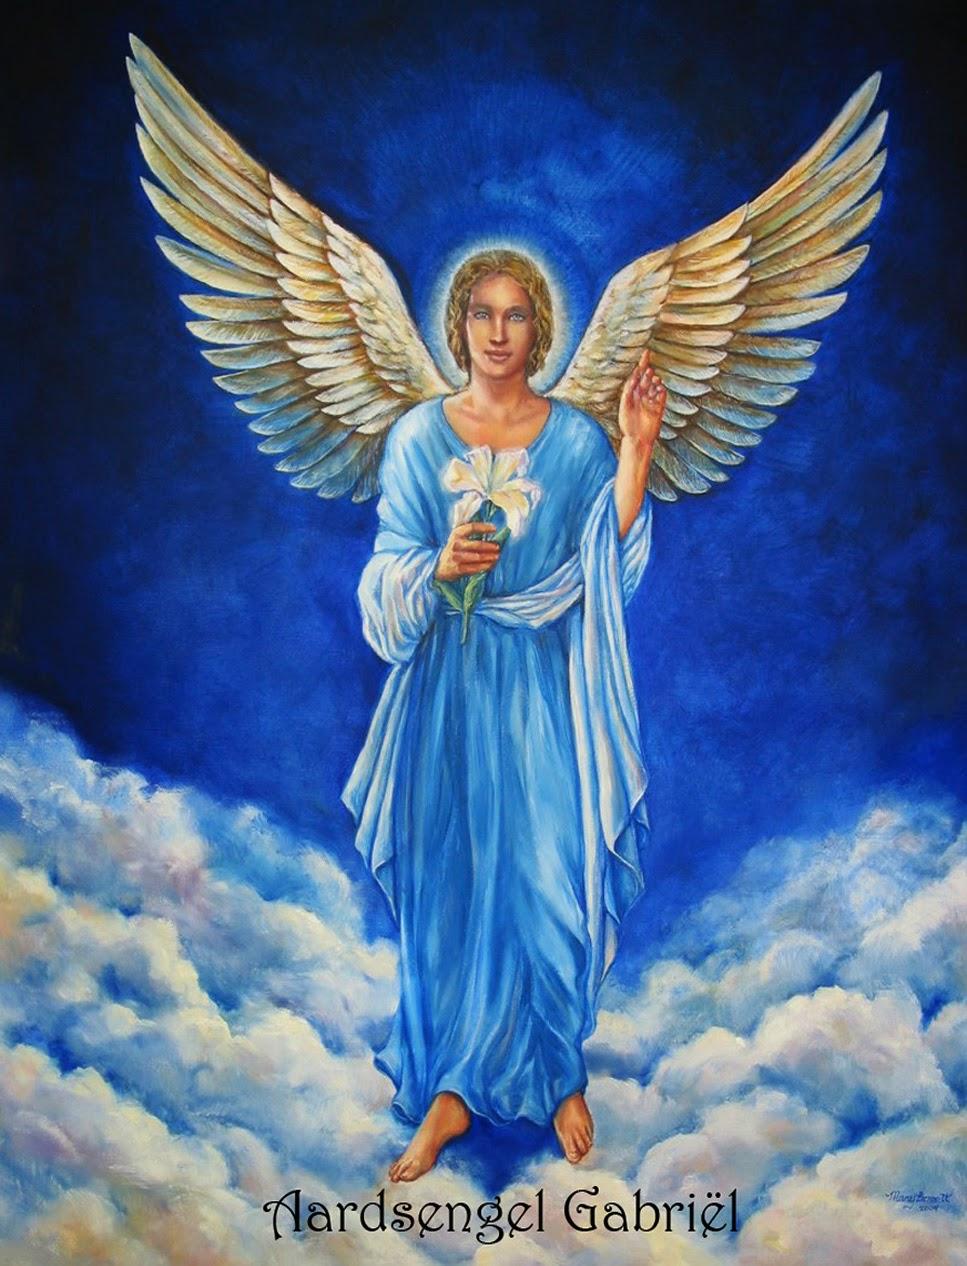 https://johnastria007.files.wordpress.com/2014/12/archangel-gabriel-for-website.jpg